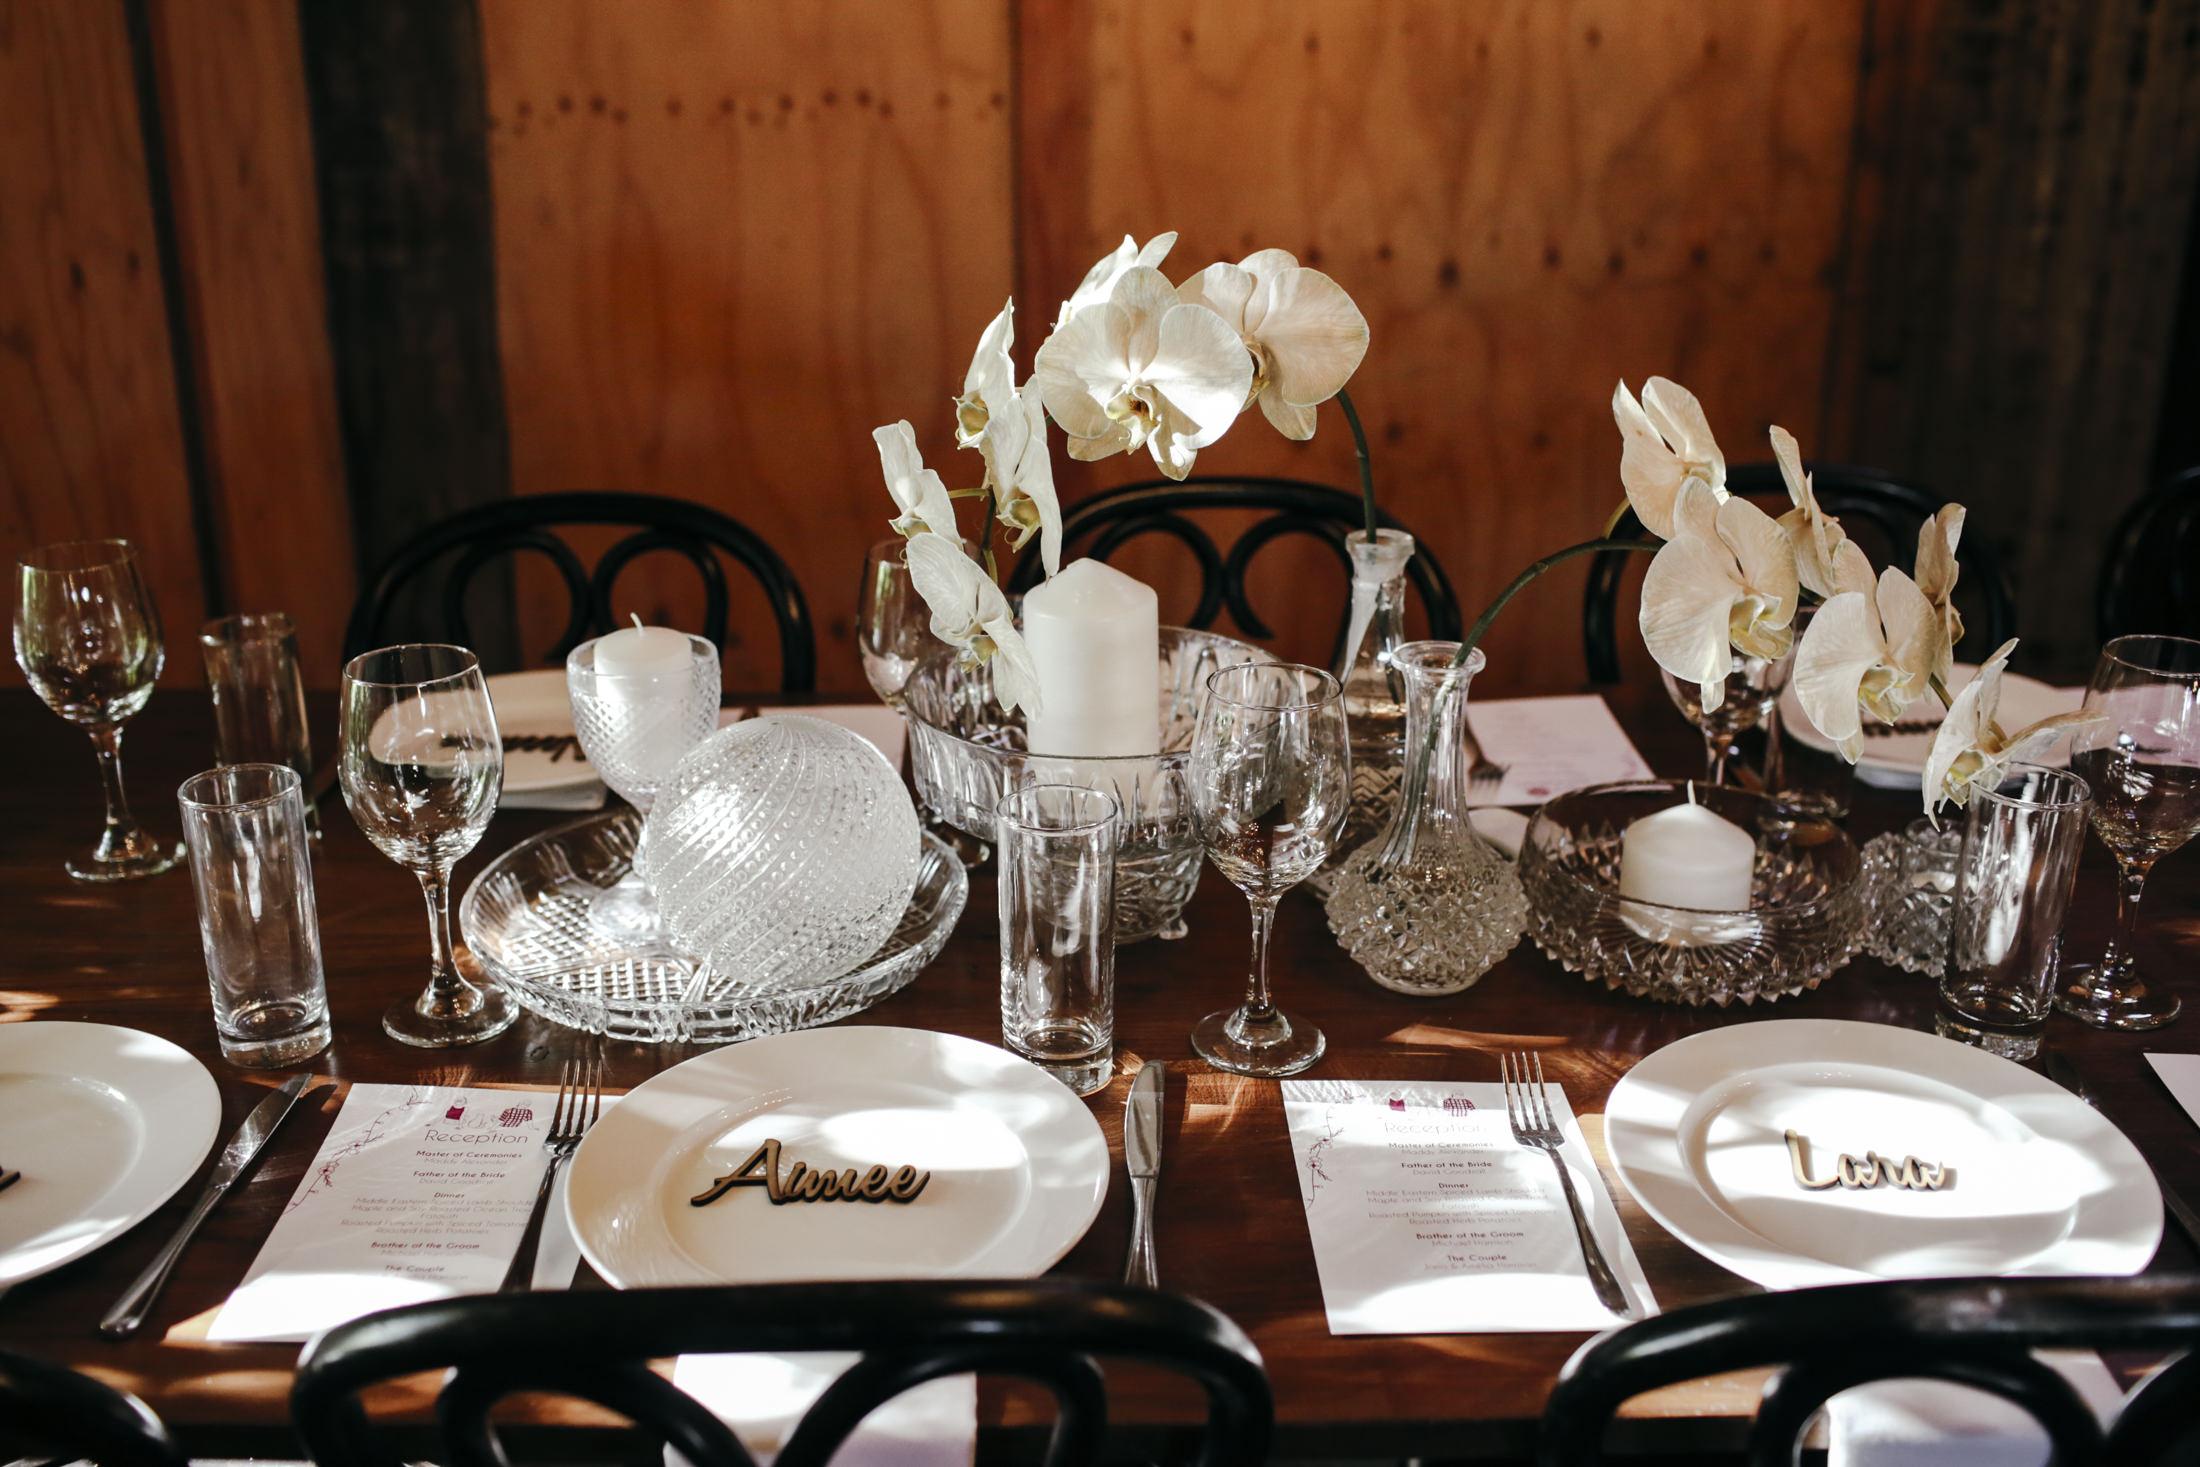 Amelia + Jono Secret Garden Table settings